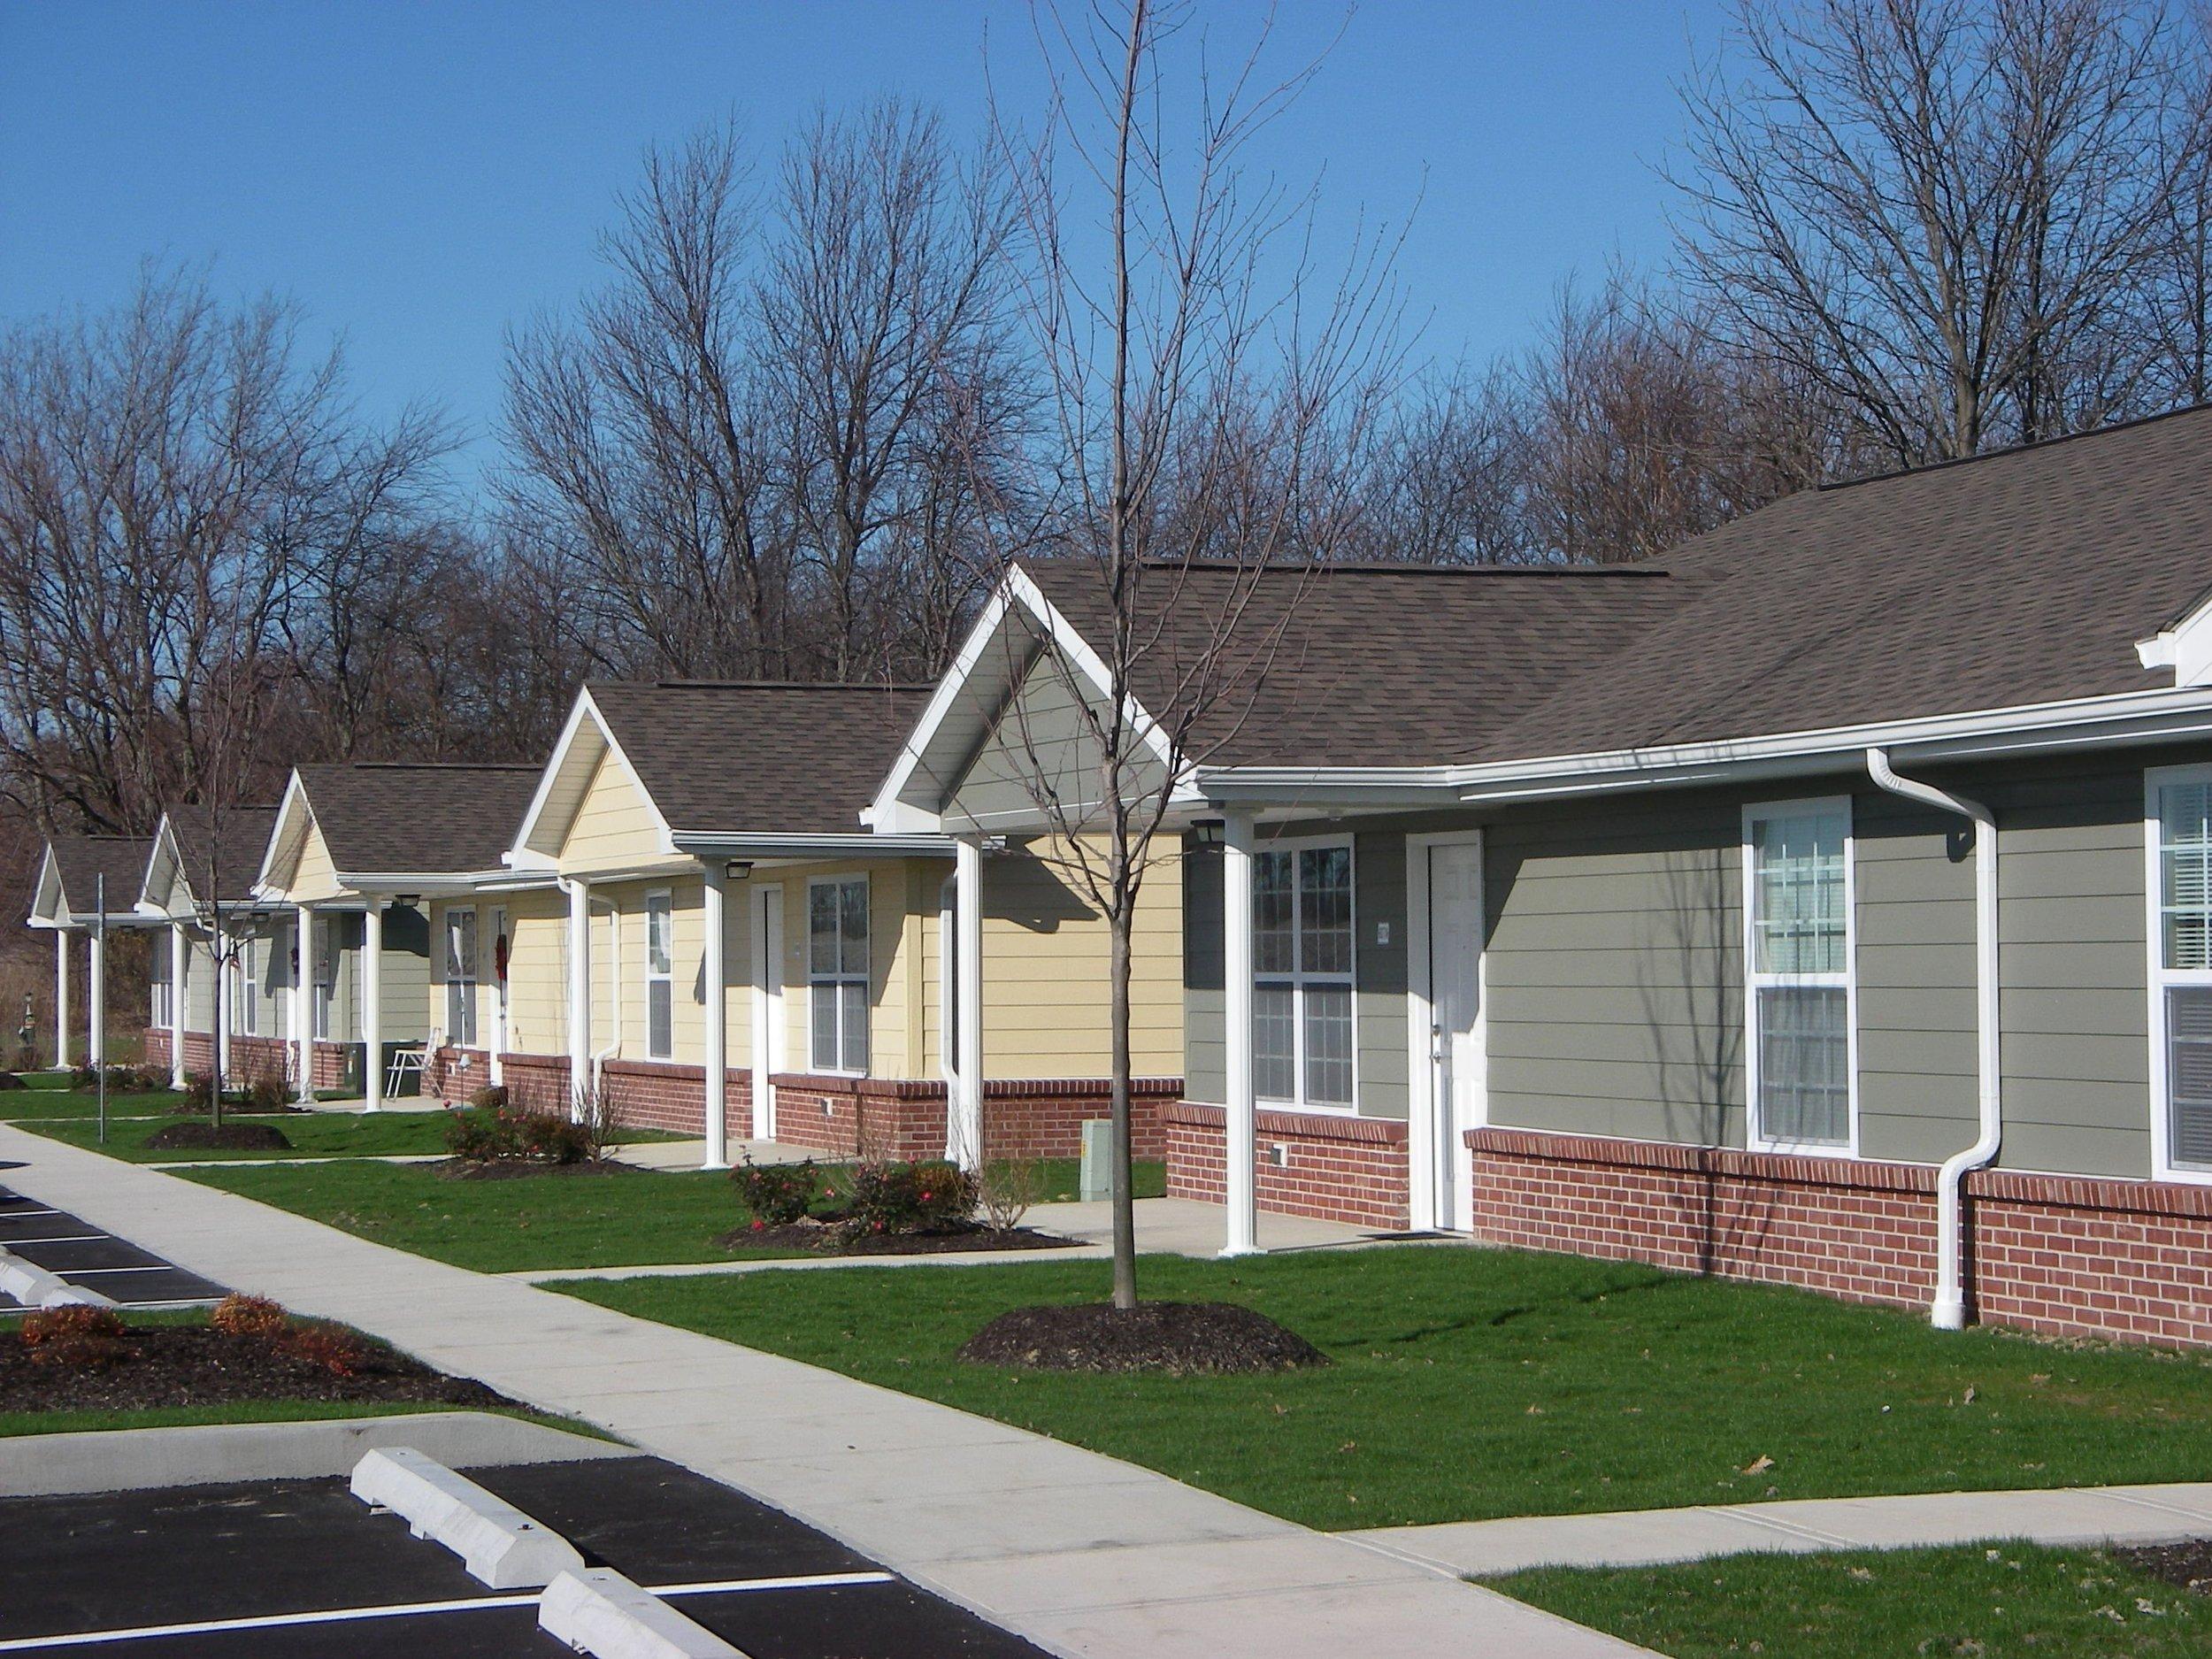 indy housing.jpg